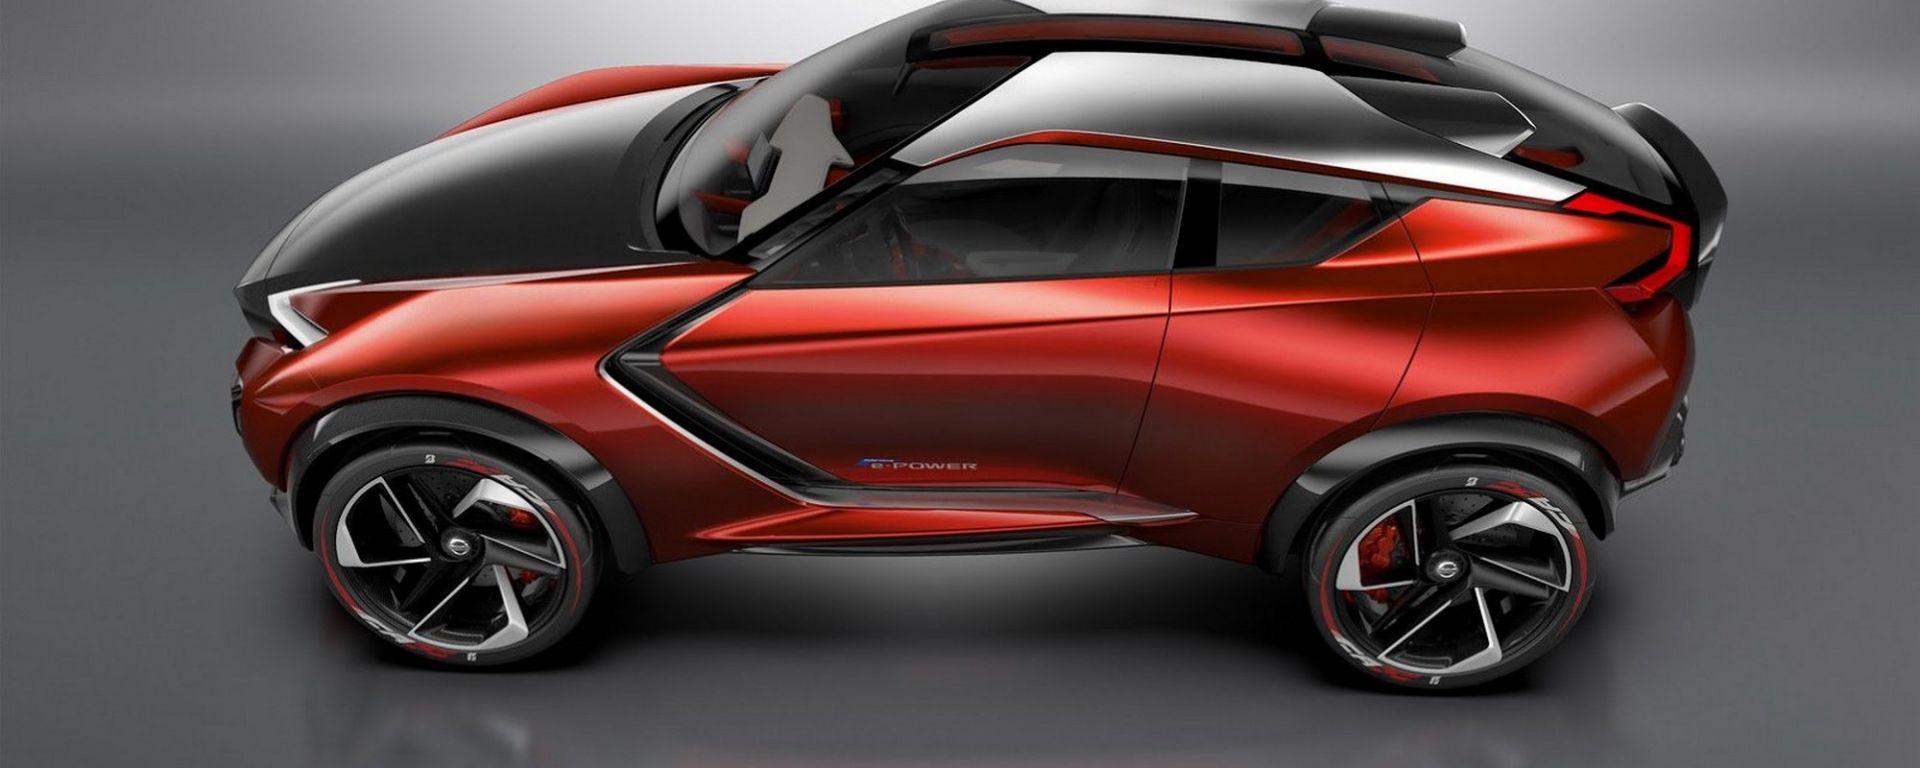 Nissan Gripz concept: lei la musa ispiratrice di nuova Juke?